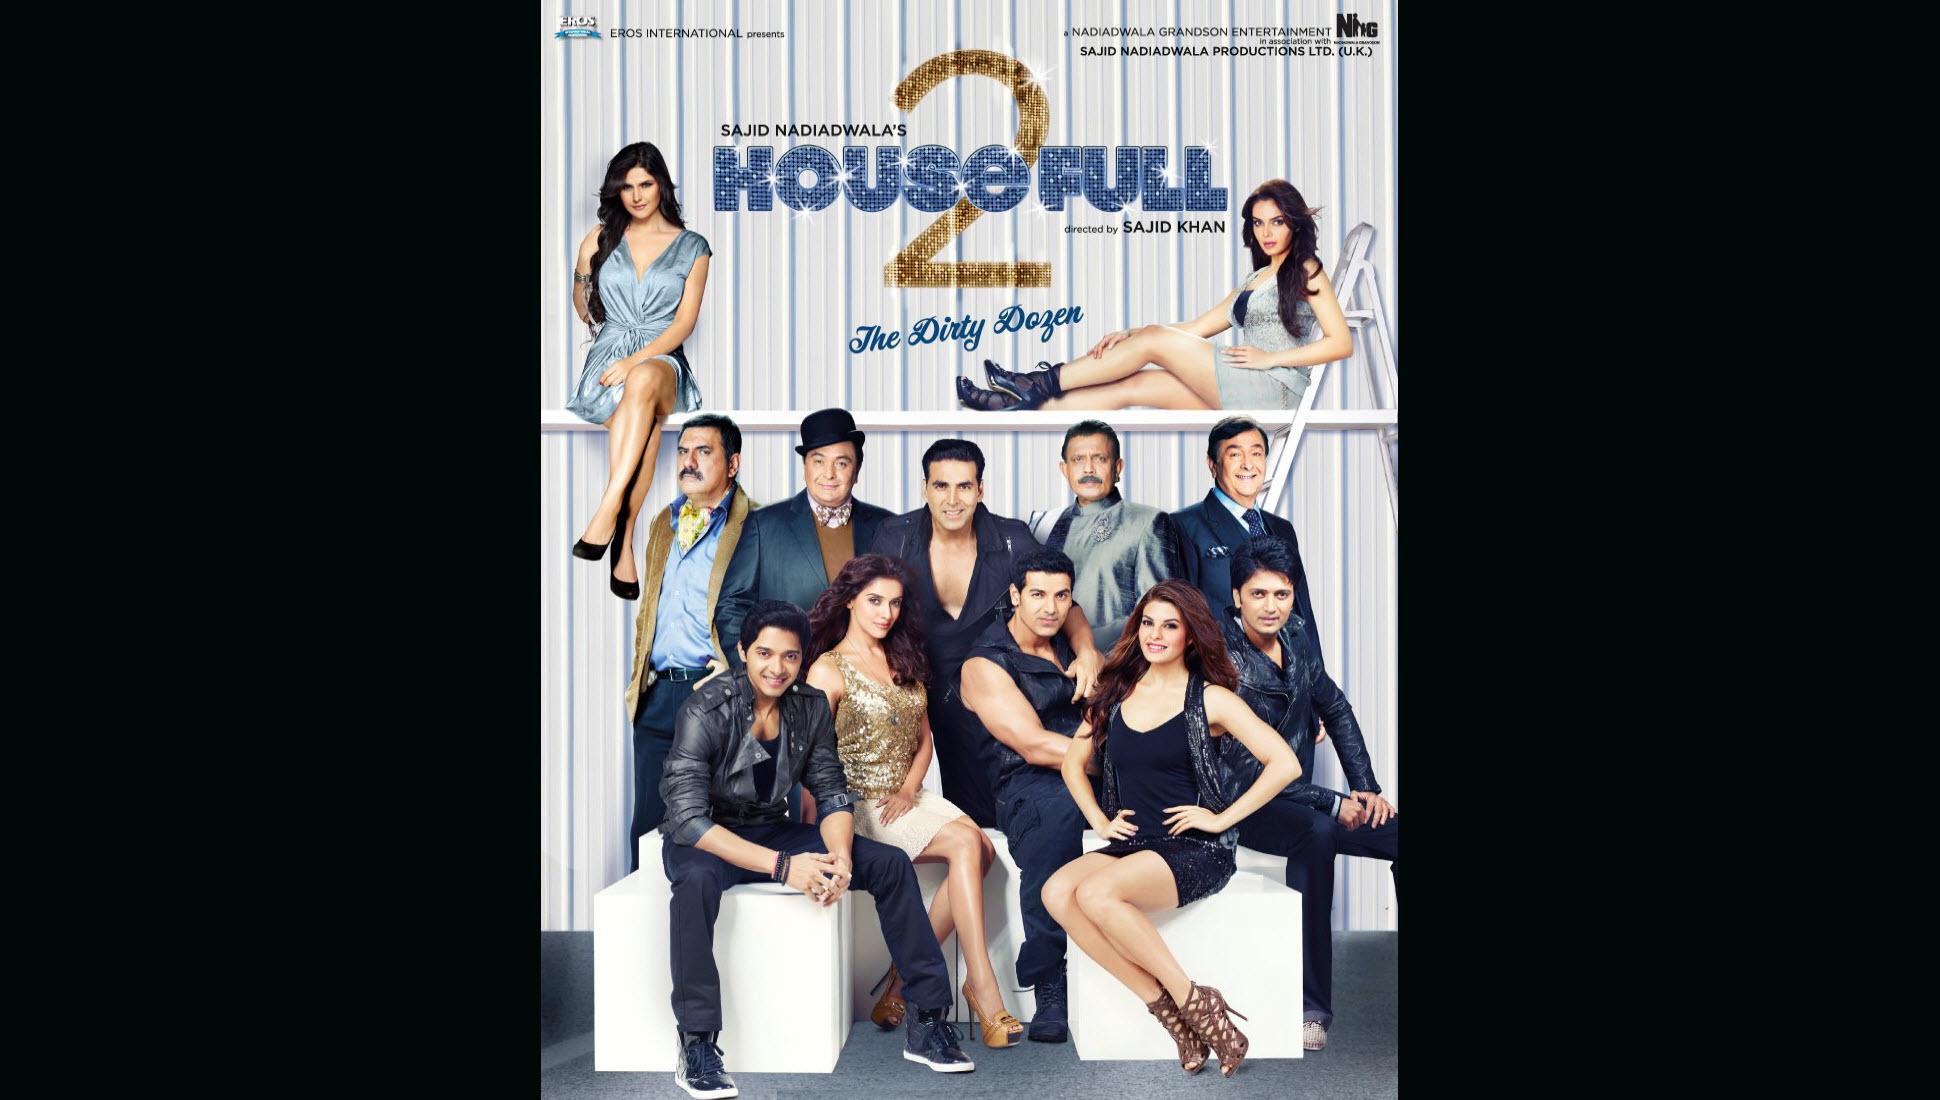 http://3.bp.blogspot.com/-ShyNigsN8H4/T1JtknWrbDI/AAAAAAAAEfs/nBAX3xBchvk/s1940/Housefull-2-featuring-+Akshay-Kumar-John-Abraham-Ritesh-Deshmukh-Jacqueline-Fernandez-Zarine-Khan-Shazahn-Padamsee-HQ-Wallpapers-02.jpg